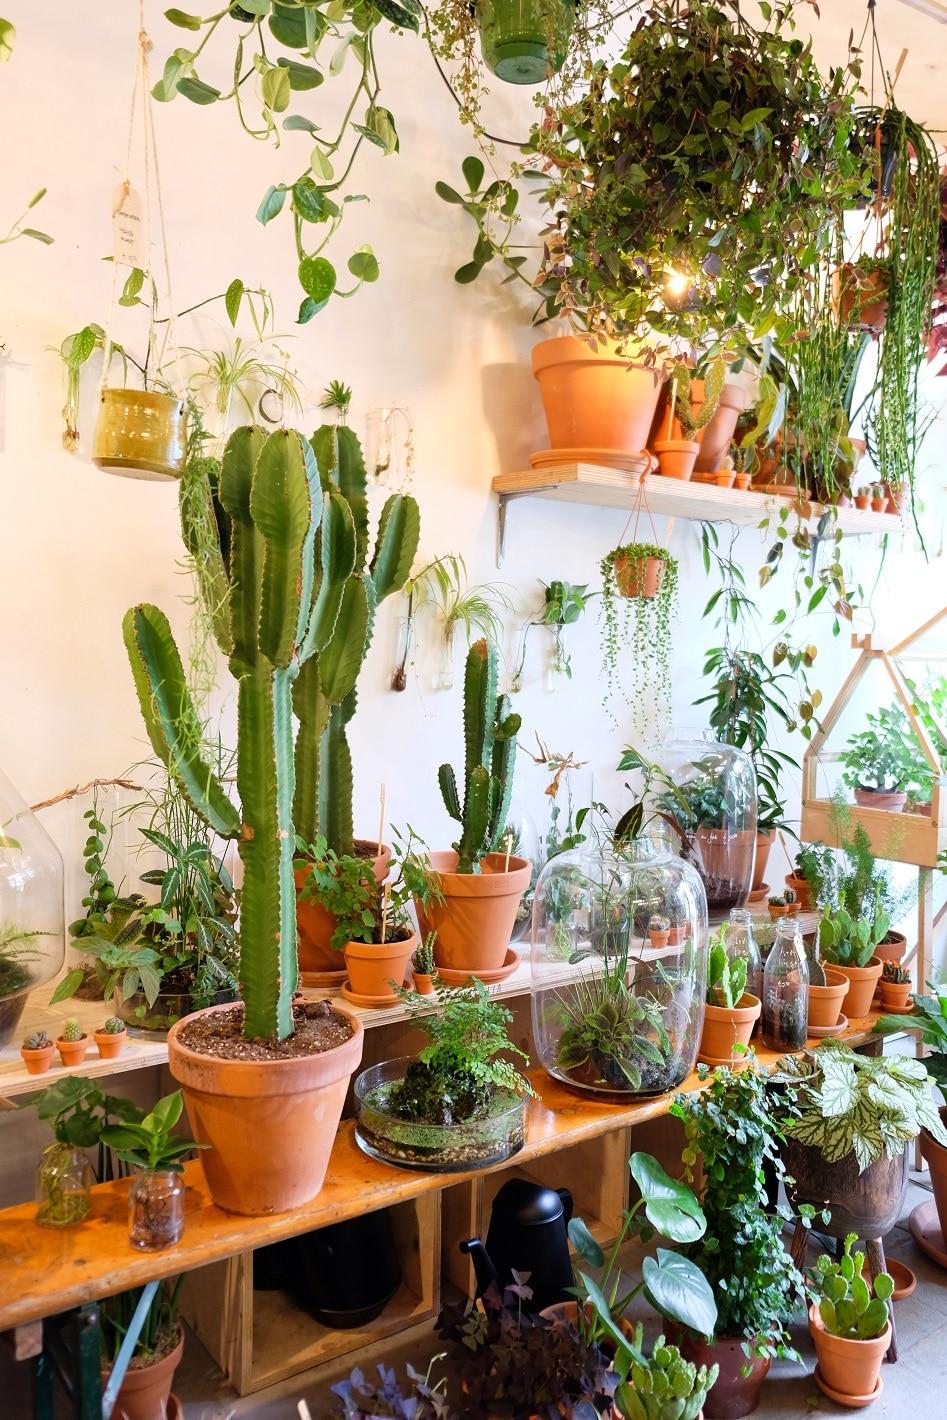 plantaardig plantenwinkel